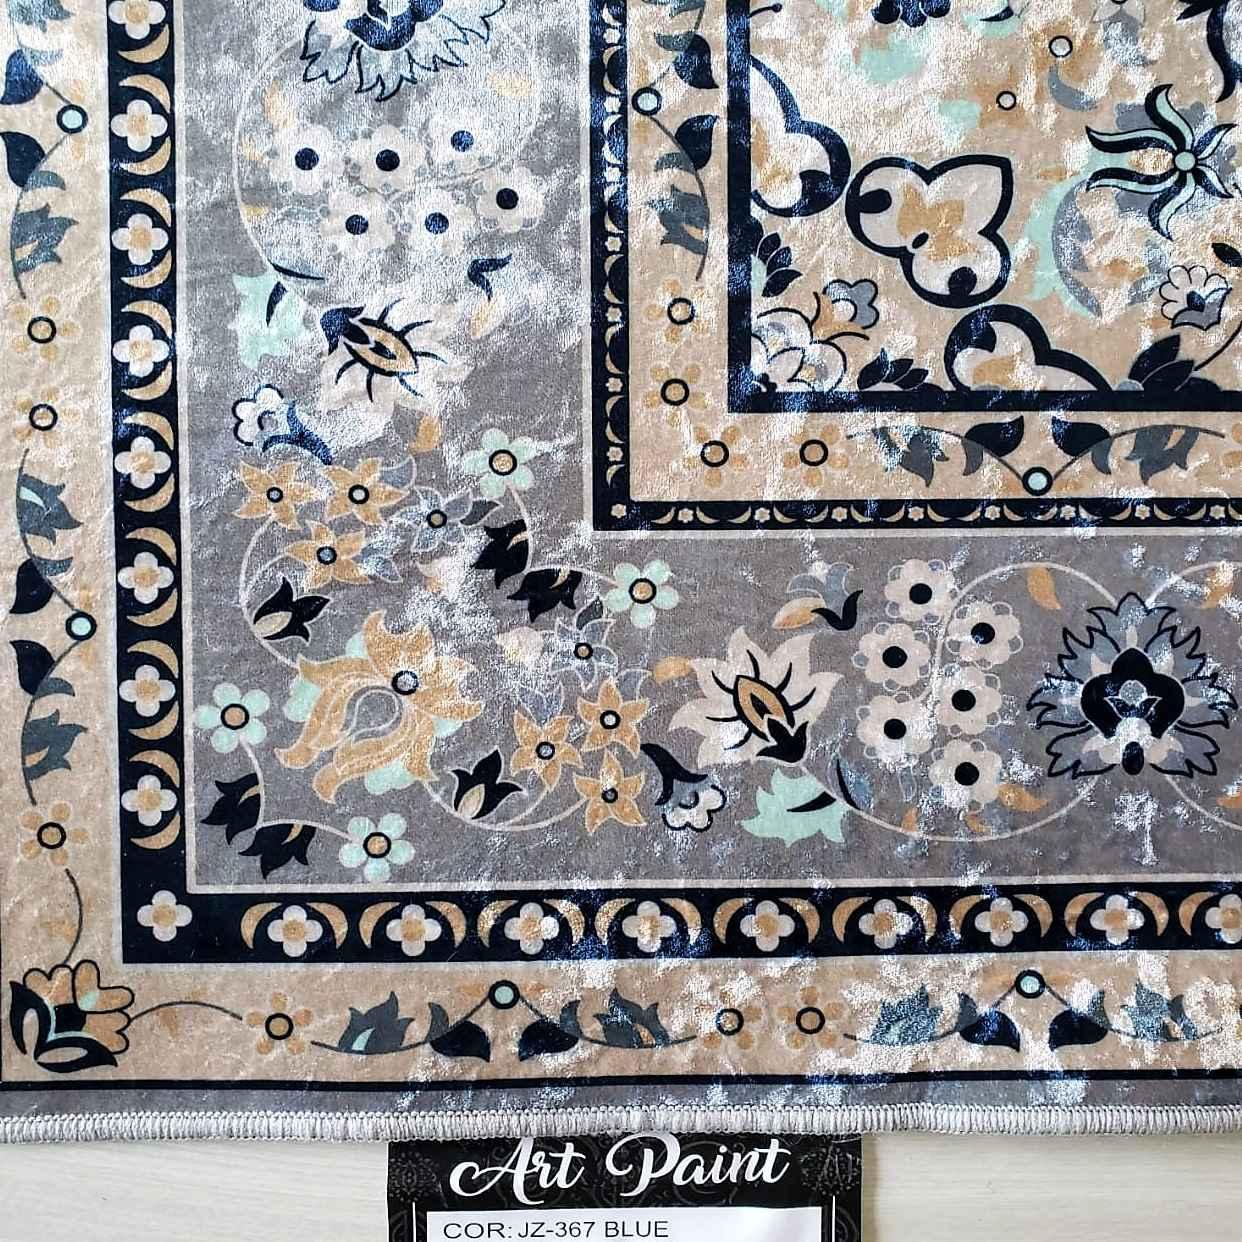 Tapete Importado Art Paint Estampado 1,50x2,00m BLUE JZ367